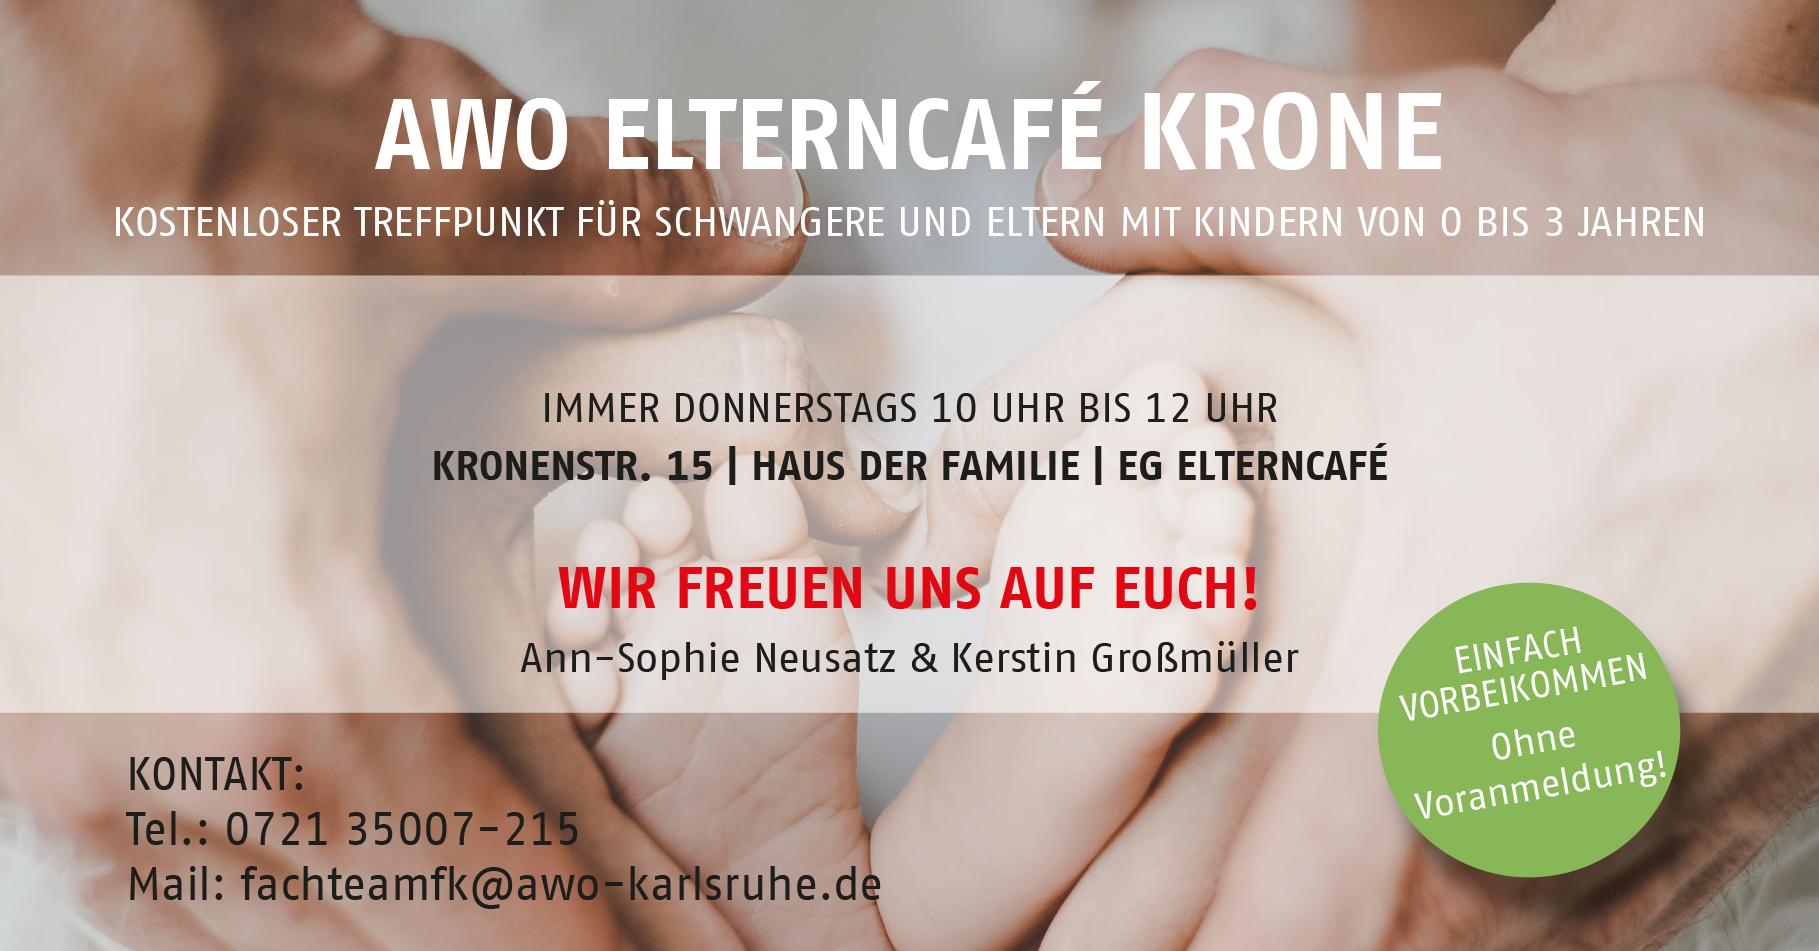 header Elterncafe Krone AWO Karlsruhe